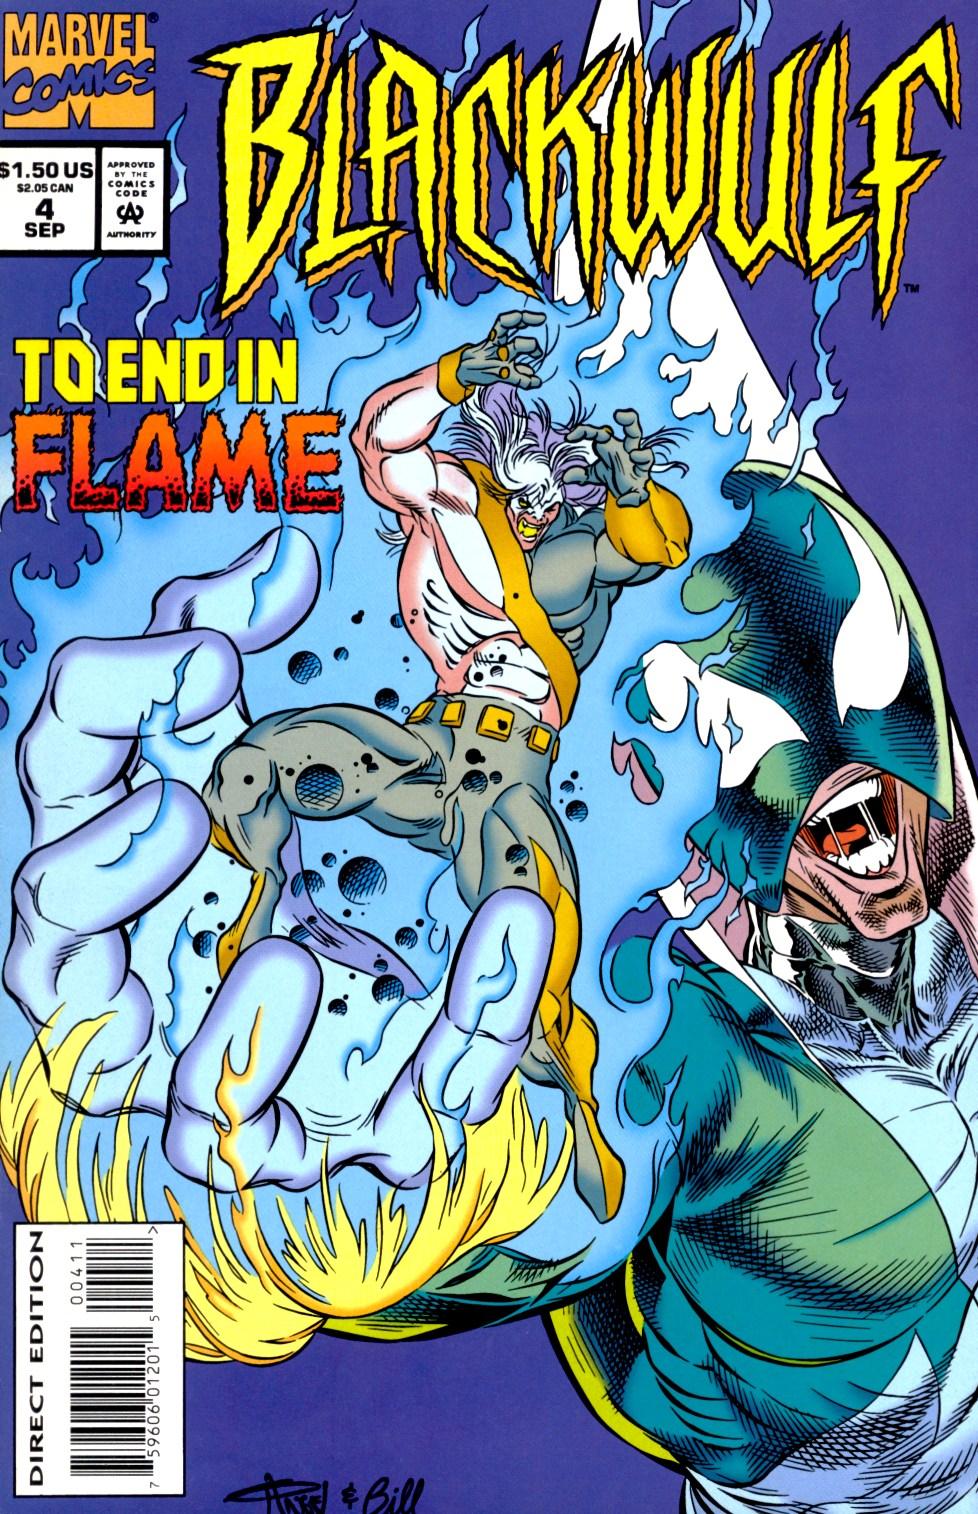 Read online Blackwulf comic -  Issue #4 - 1